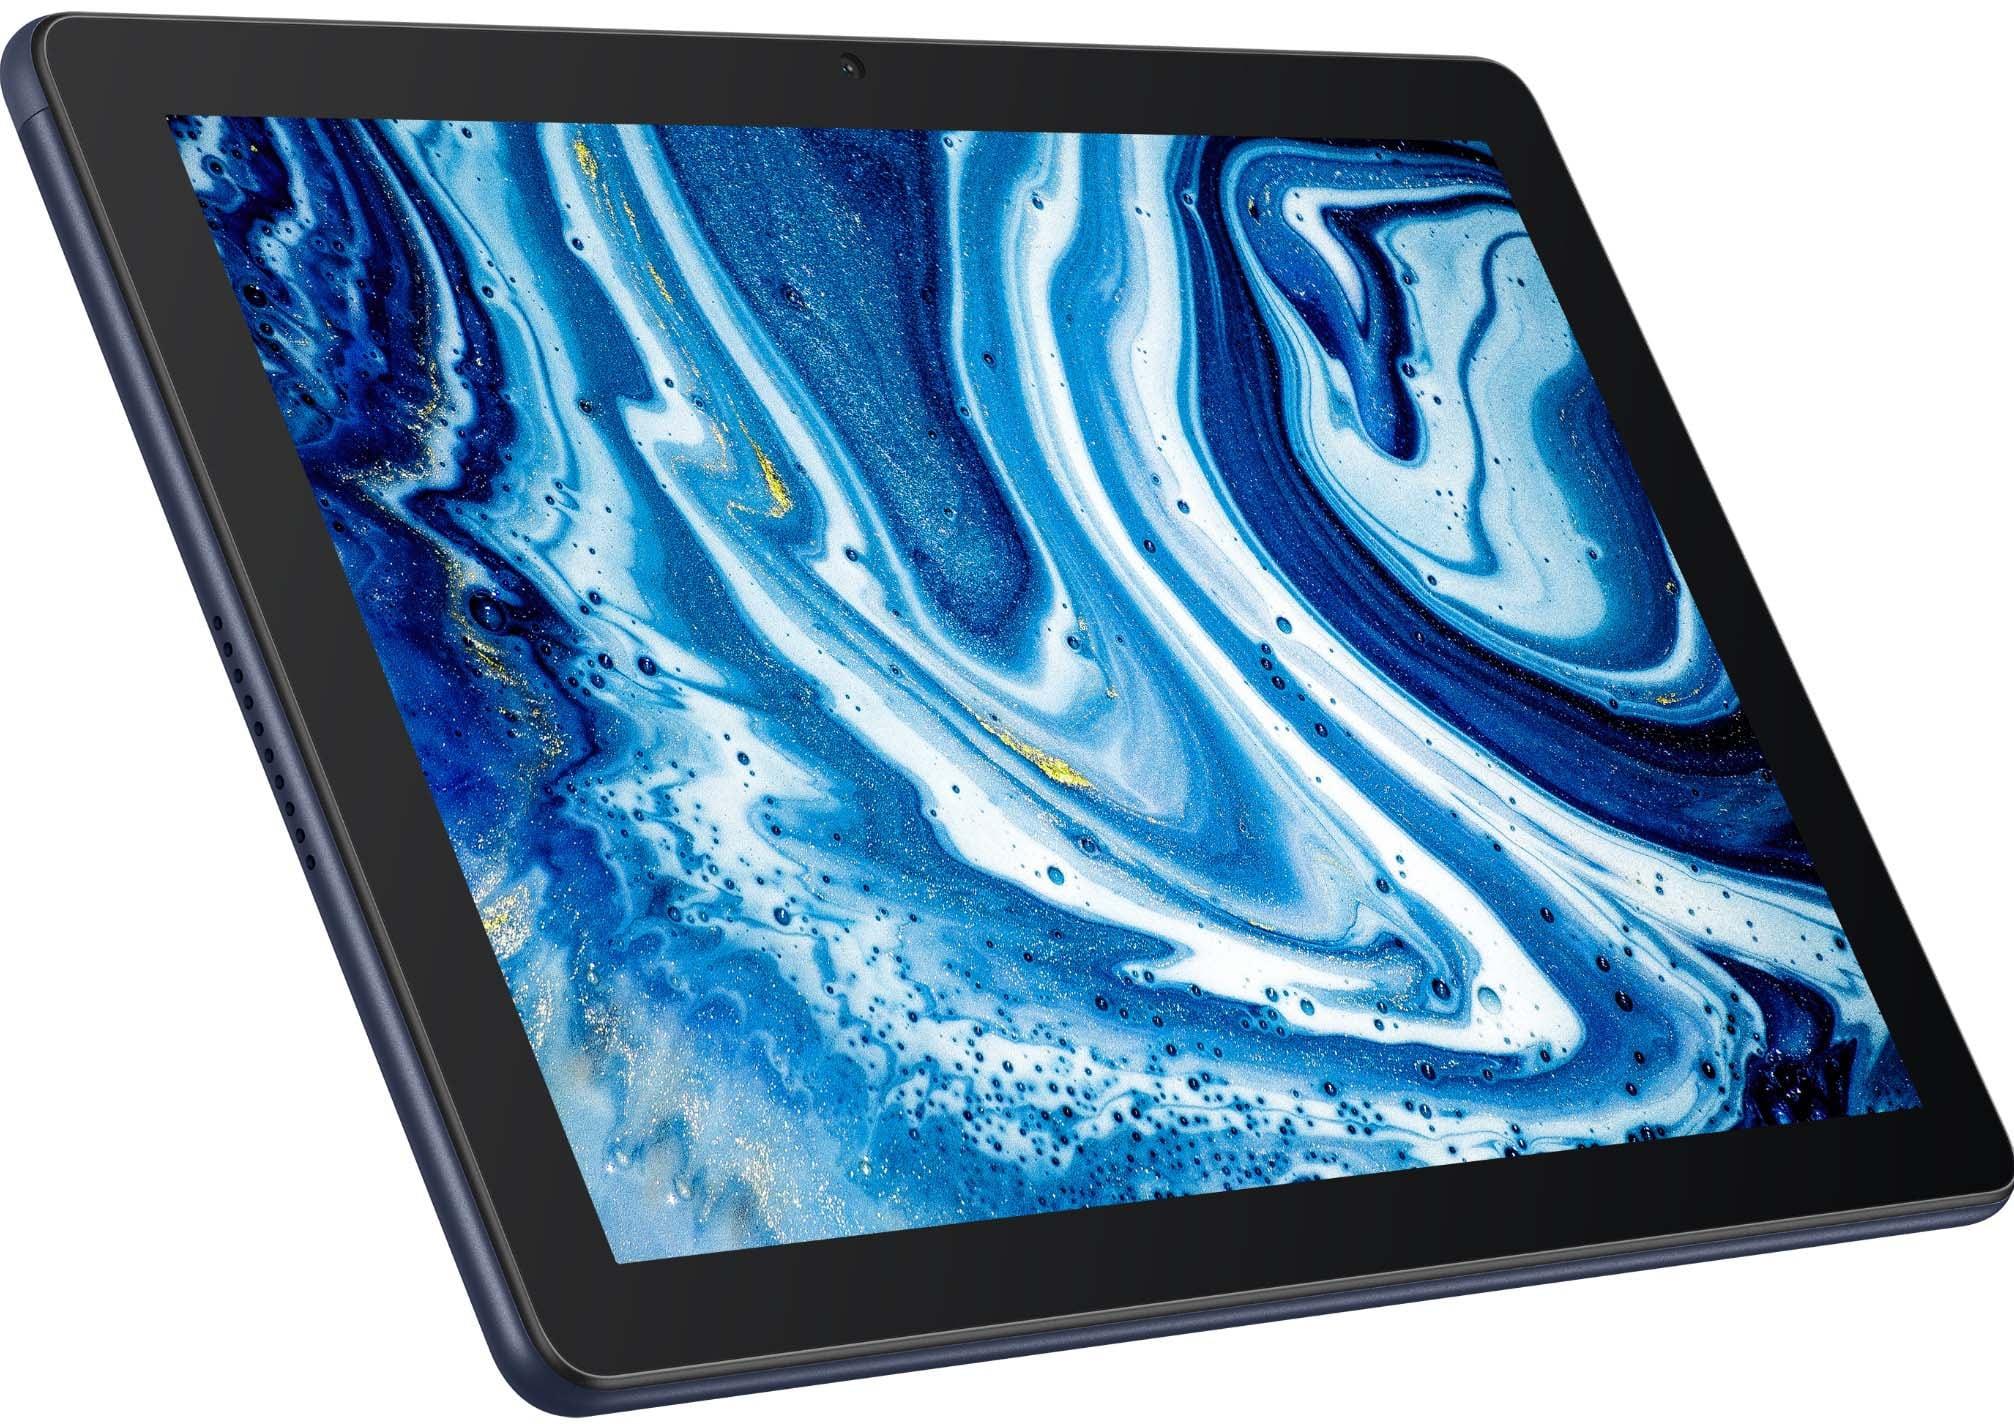 Huawei MatePad T10 2/16 GB WIFI tablet, Deepsea Blue